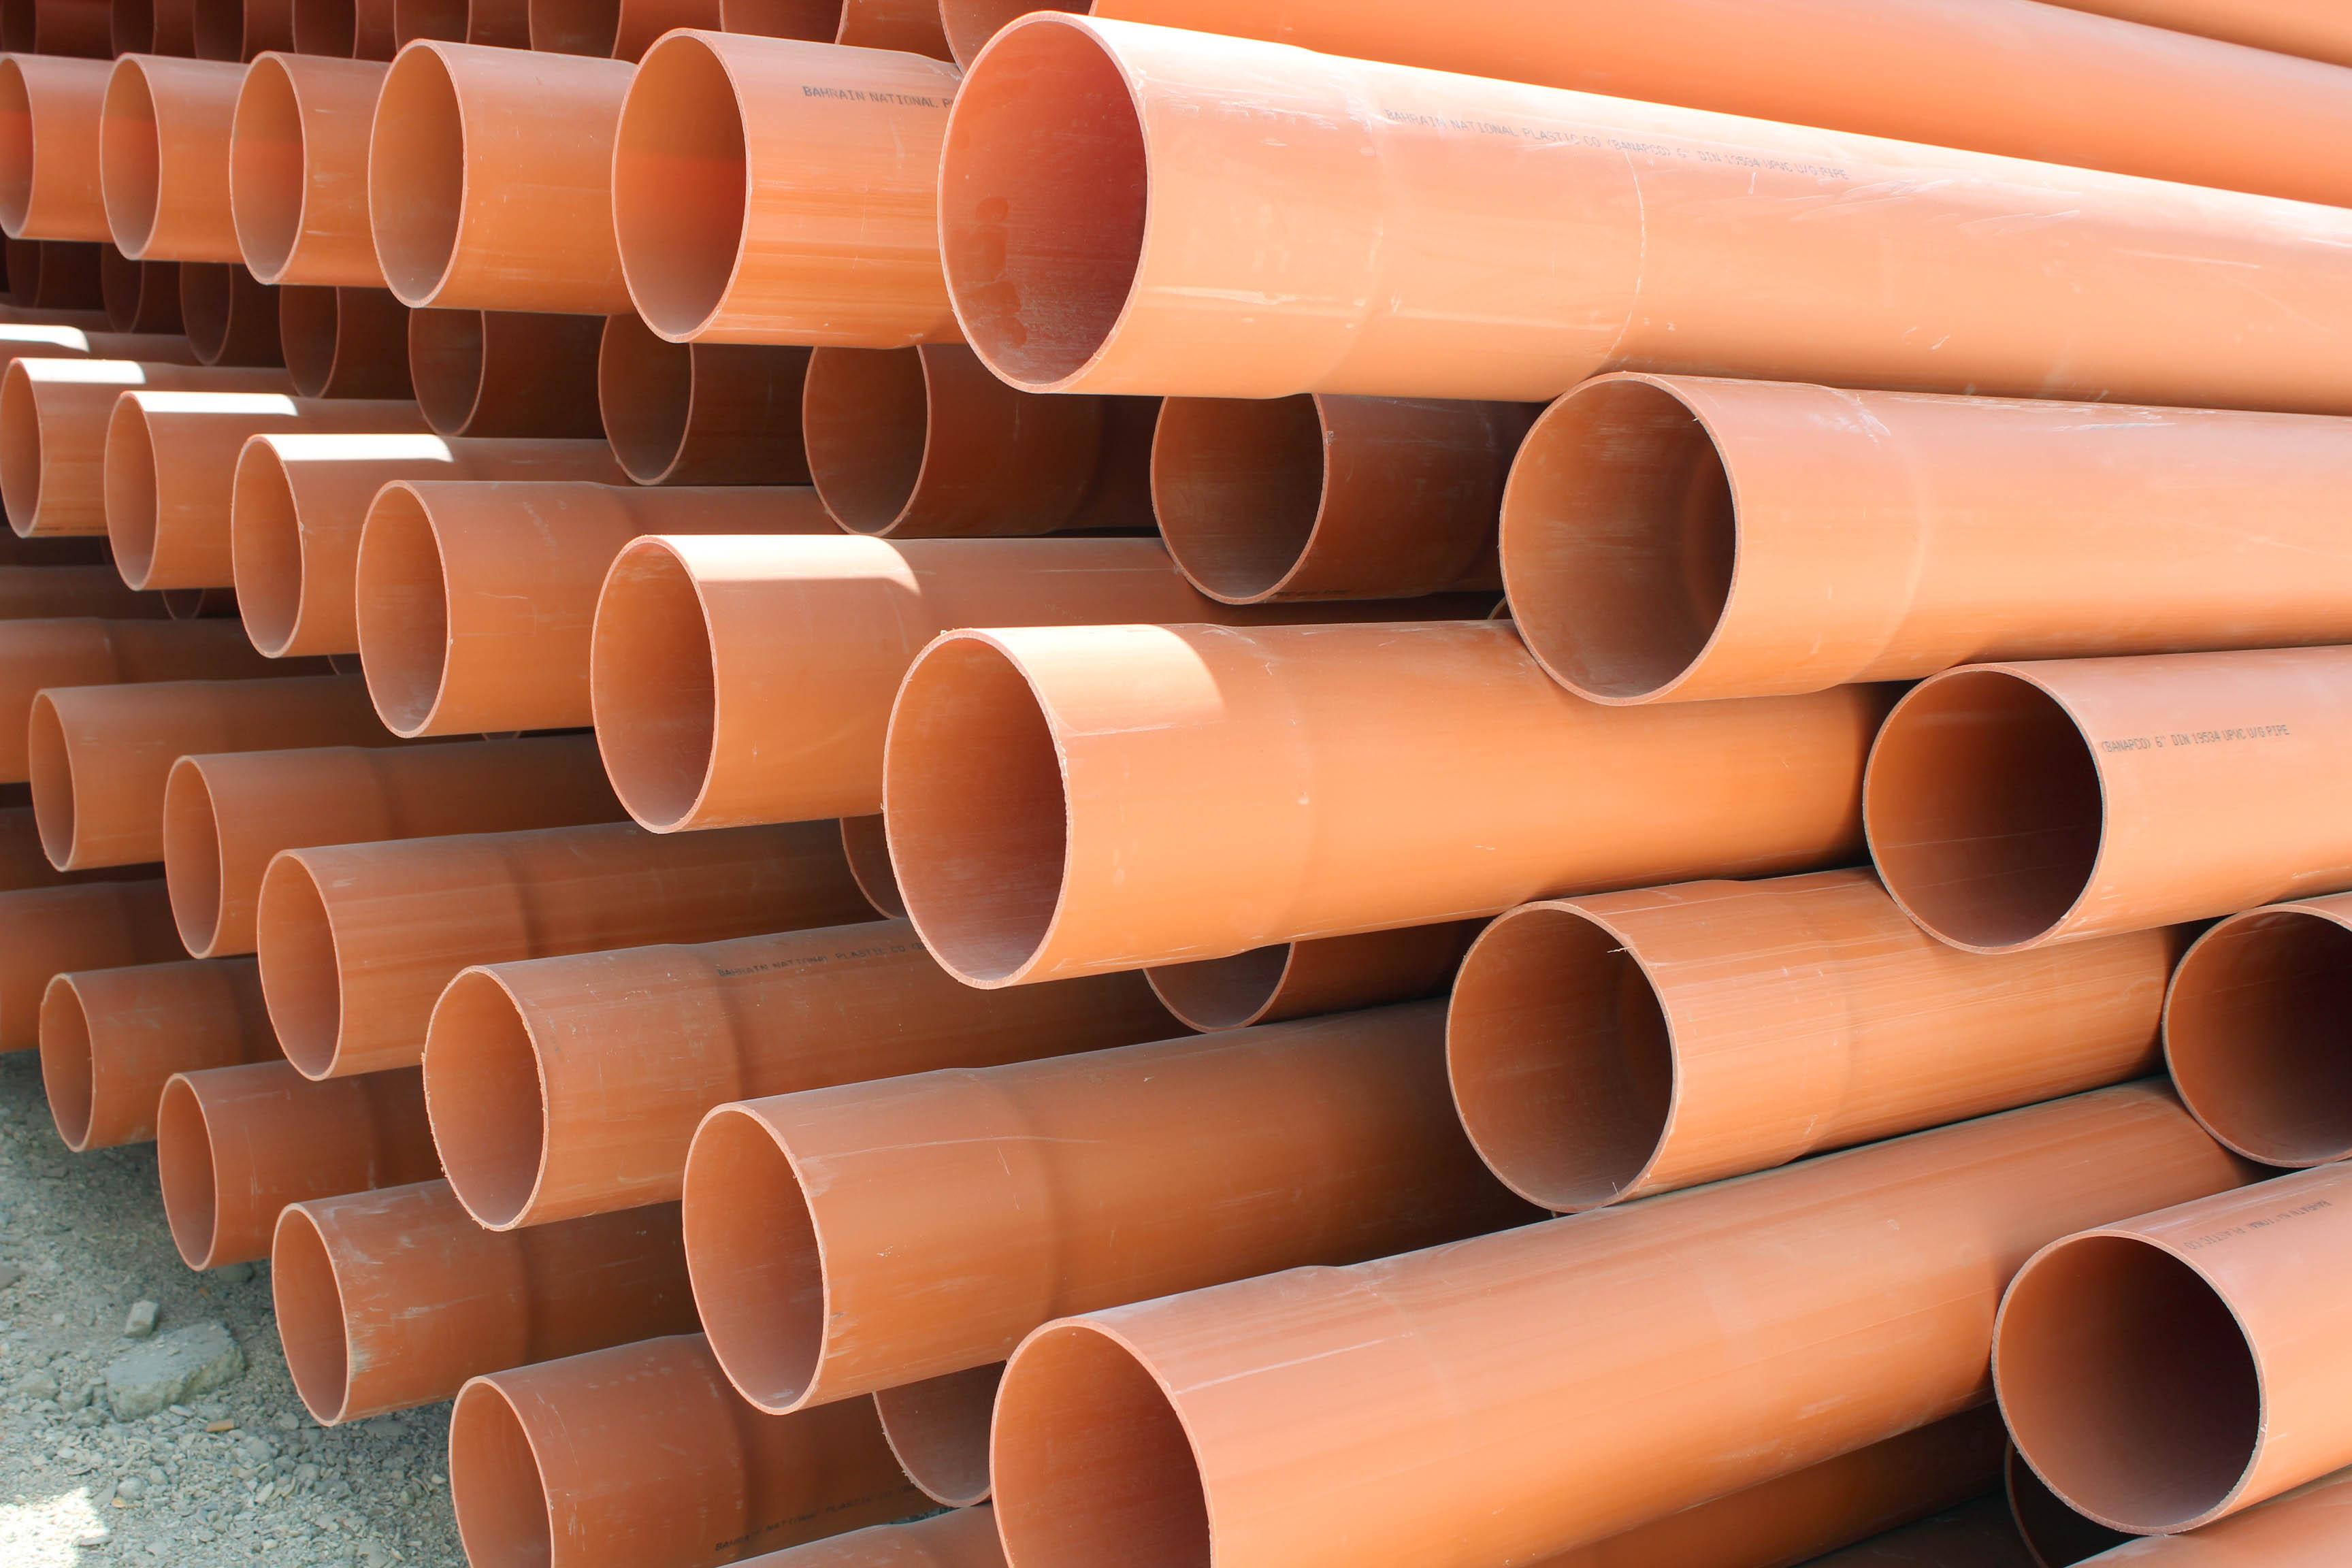 Bahrain National Plastic Company (BANAPCO) U-PVC Pipes